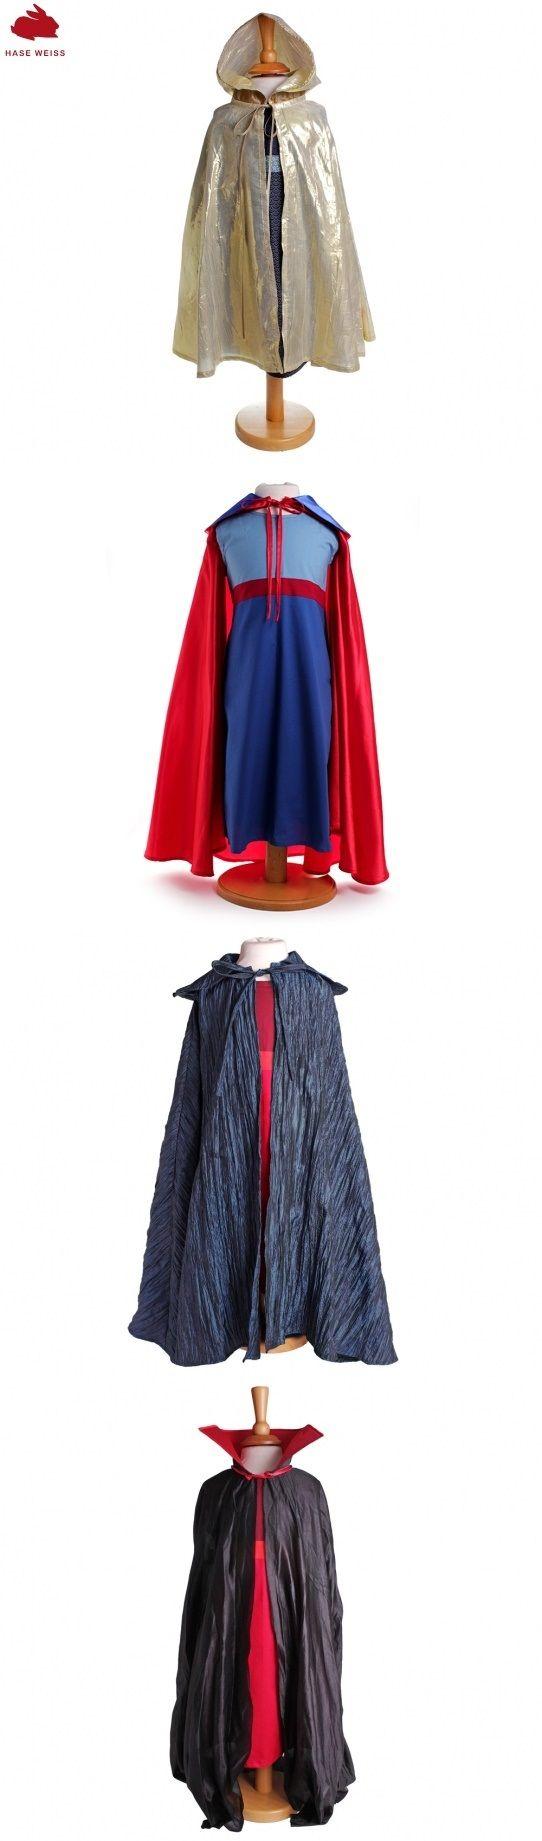 #cloak #costume #magic  #umhang #verkleiden #zauber #kinderfasching